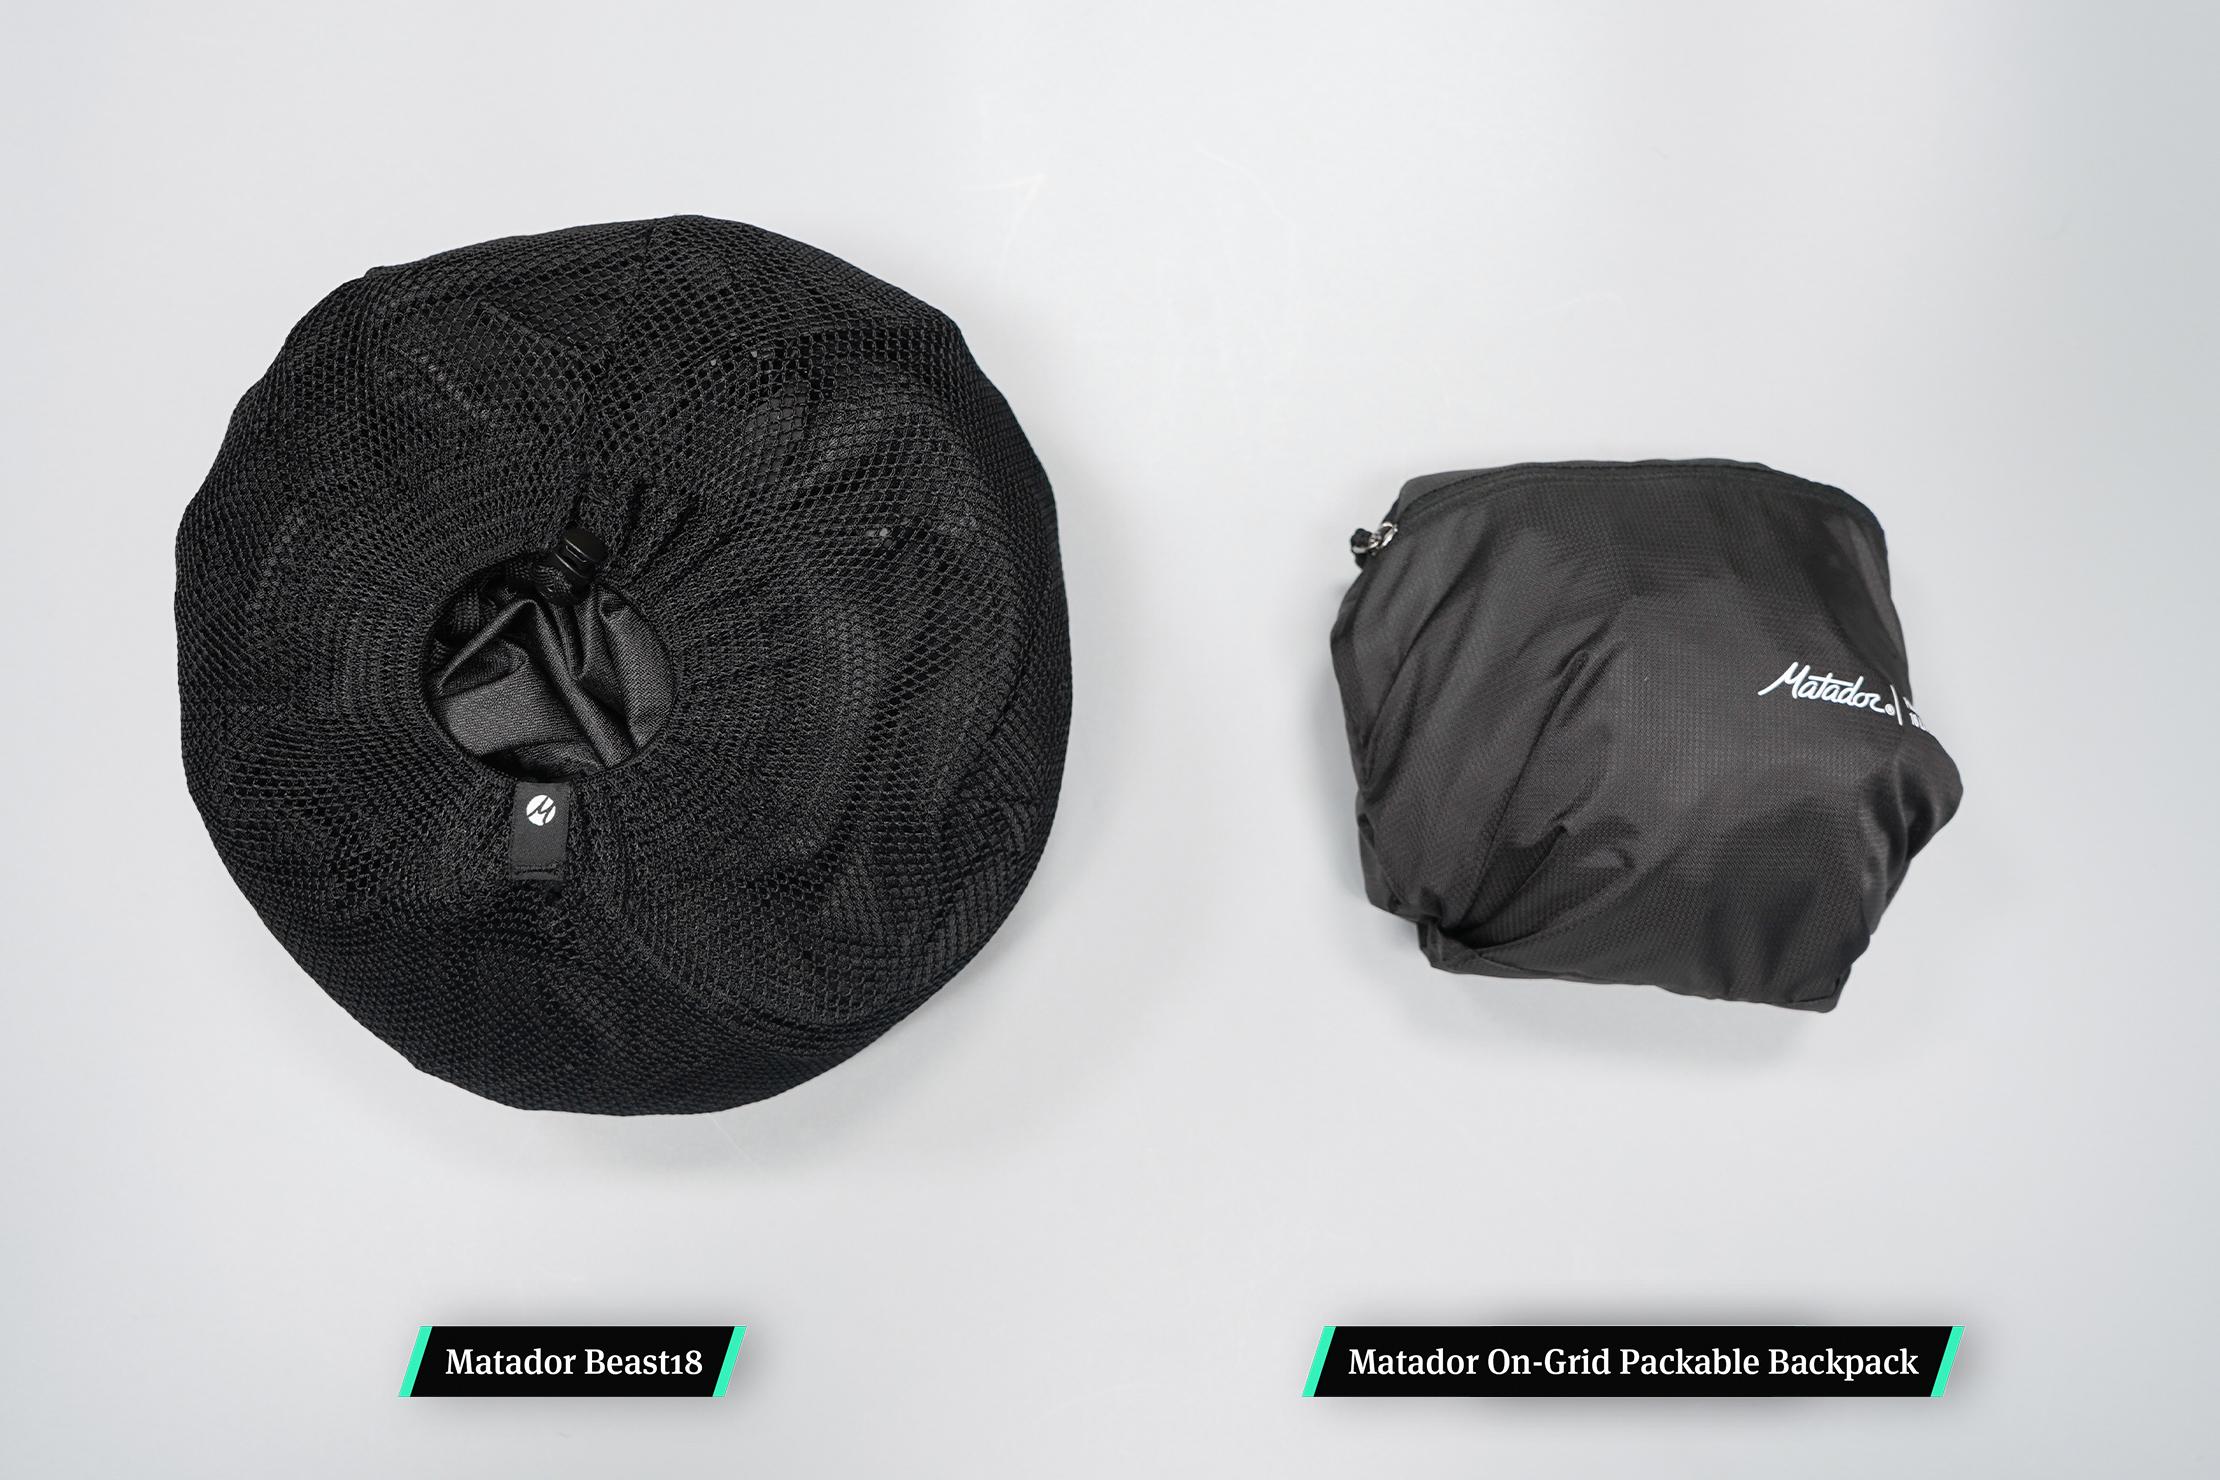 Left: Matador Beast18 Compressed | Right: Matador On-Grid Packable Backpack Compressed